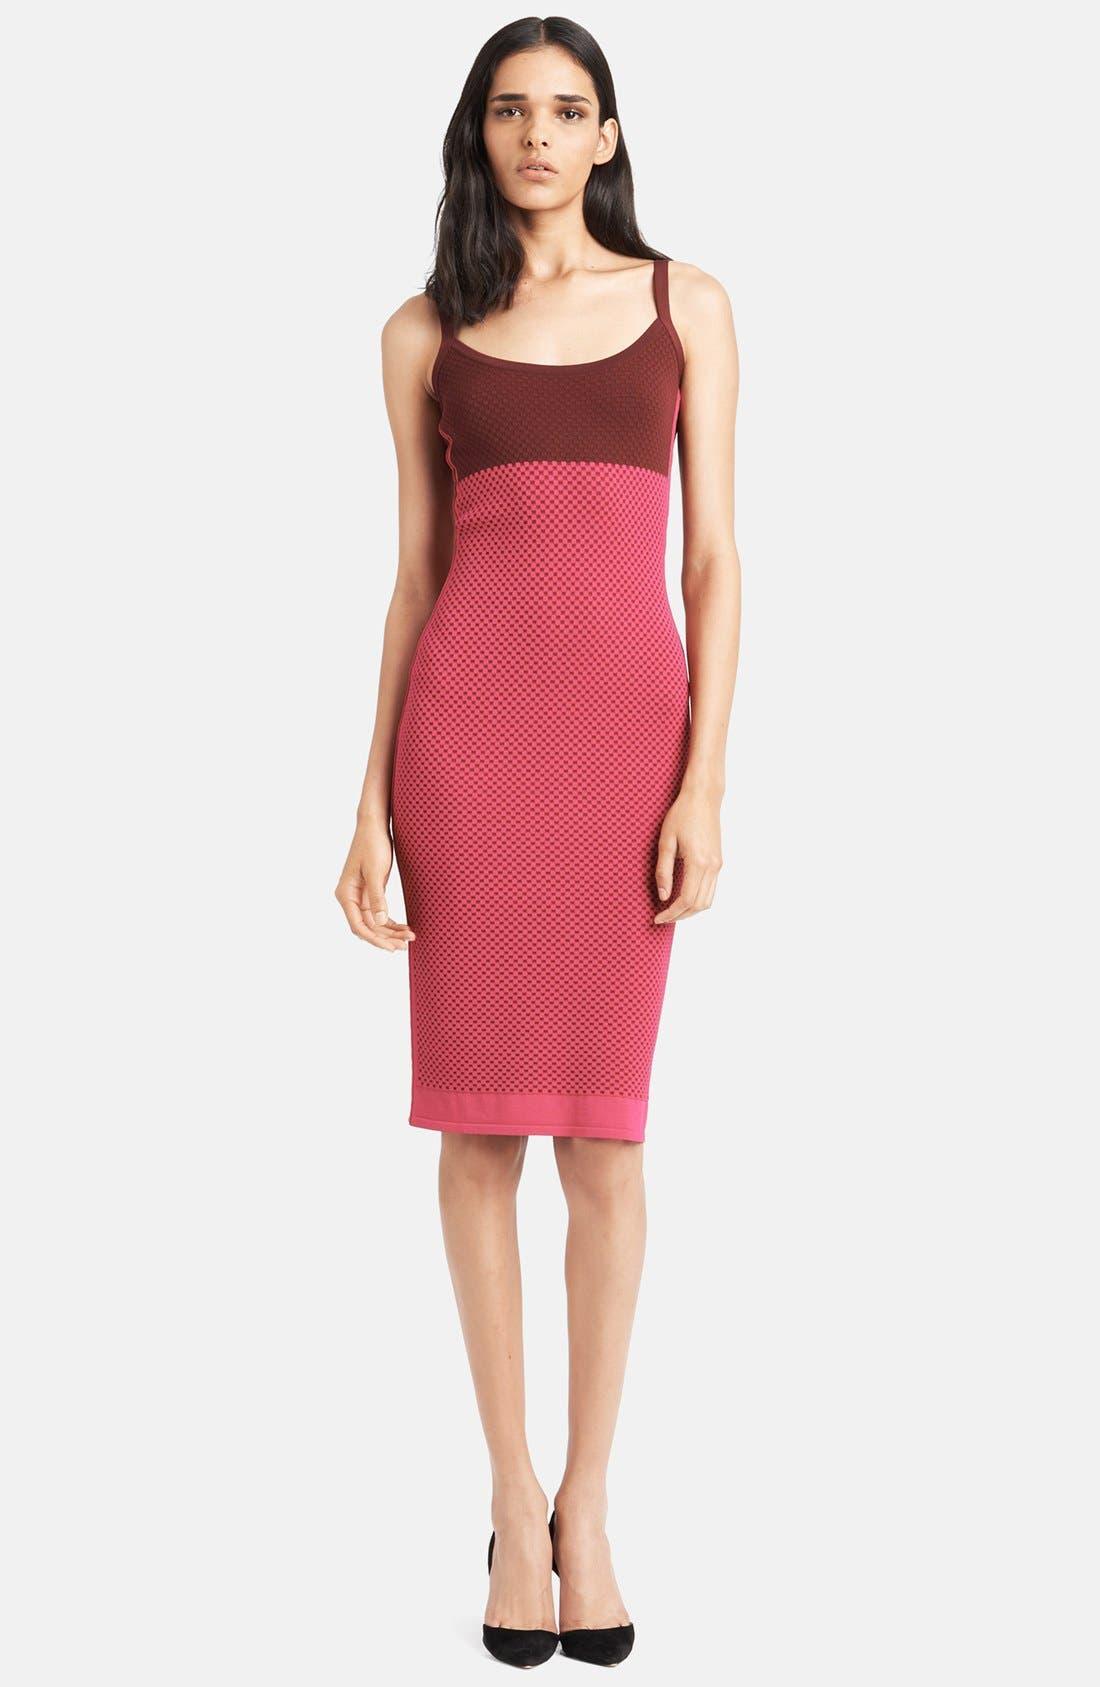 Alternate Image 1 Selected - Narciso Rodriguez Colorblock Knit Tank Dress